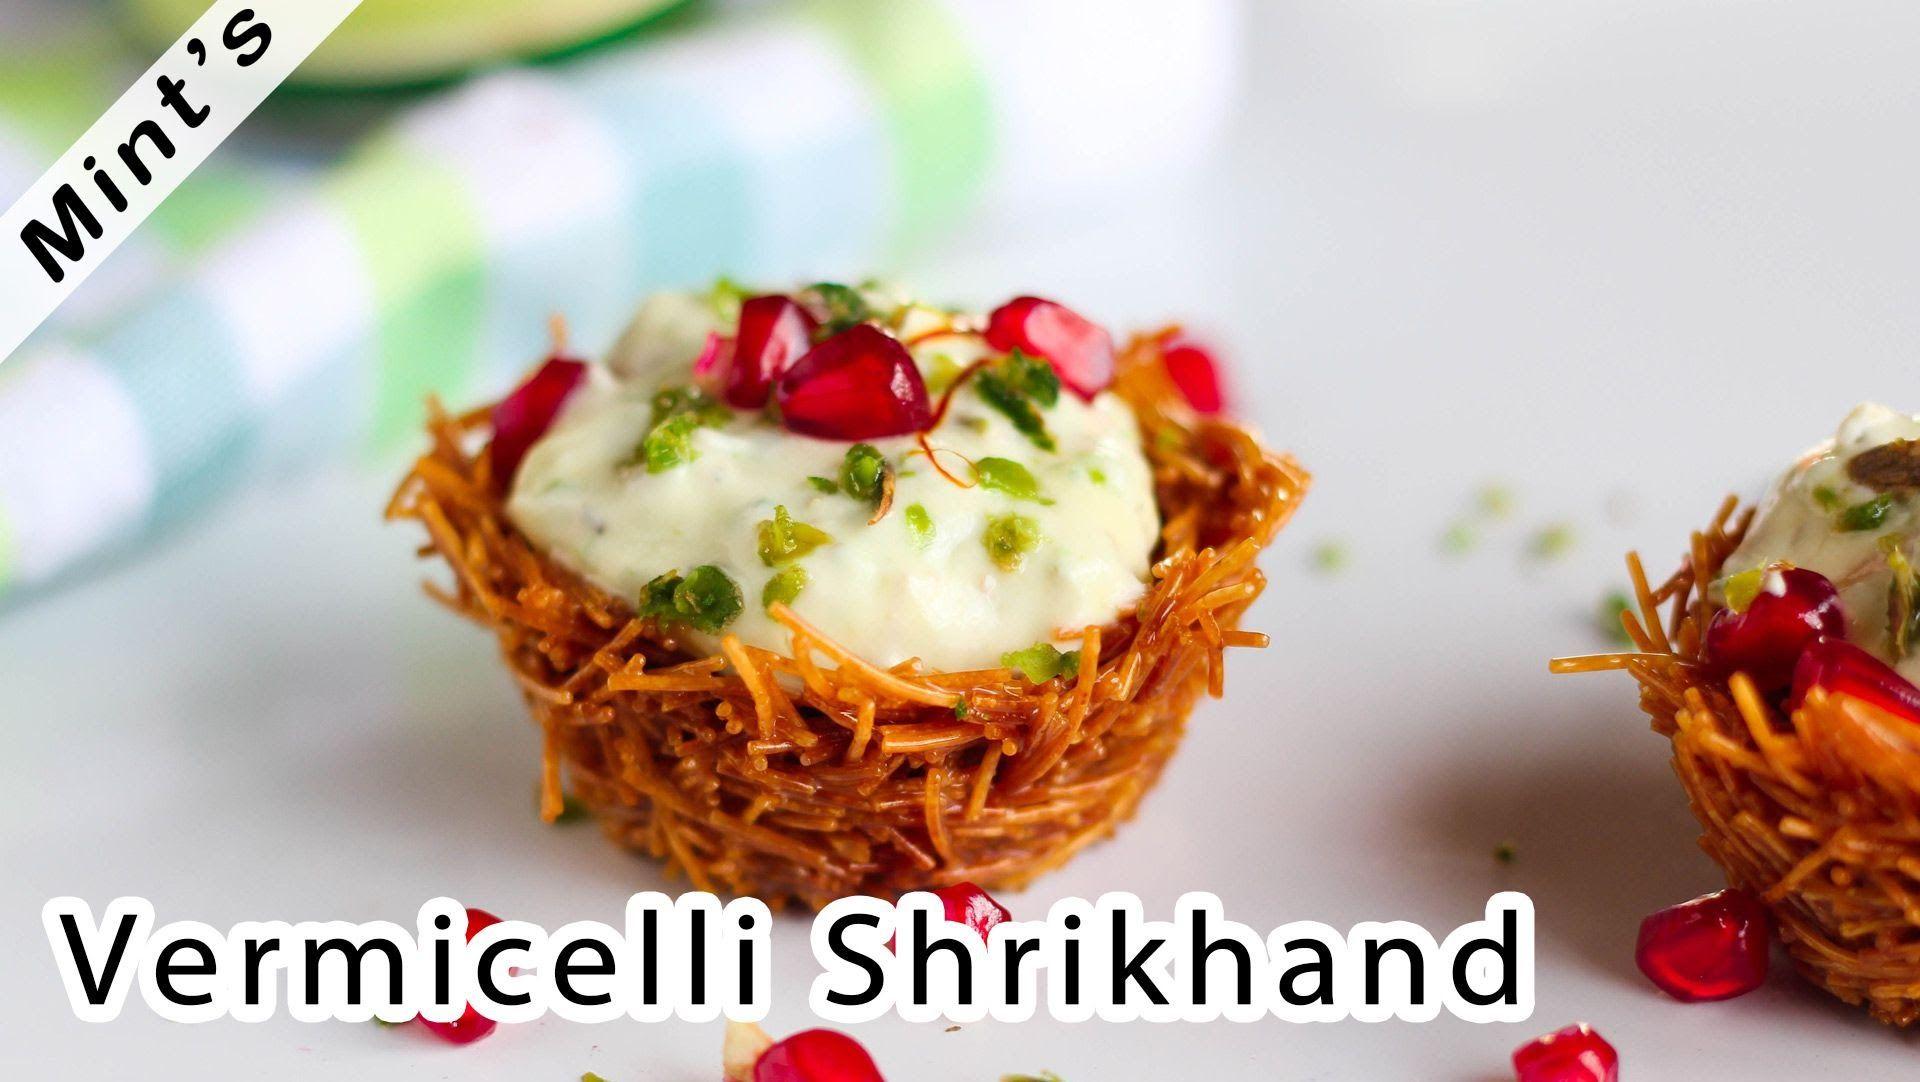 Vermicelli shrikhand recipe indian dessert recipes recipe in vermicelli shrikhand recipe indian dessert recipes recipe in hindi forumfinder Images